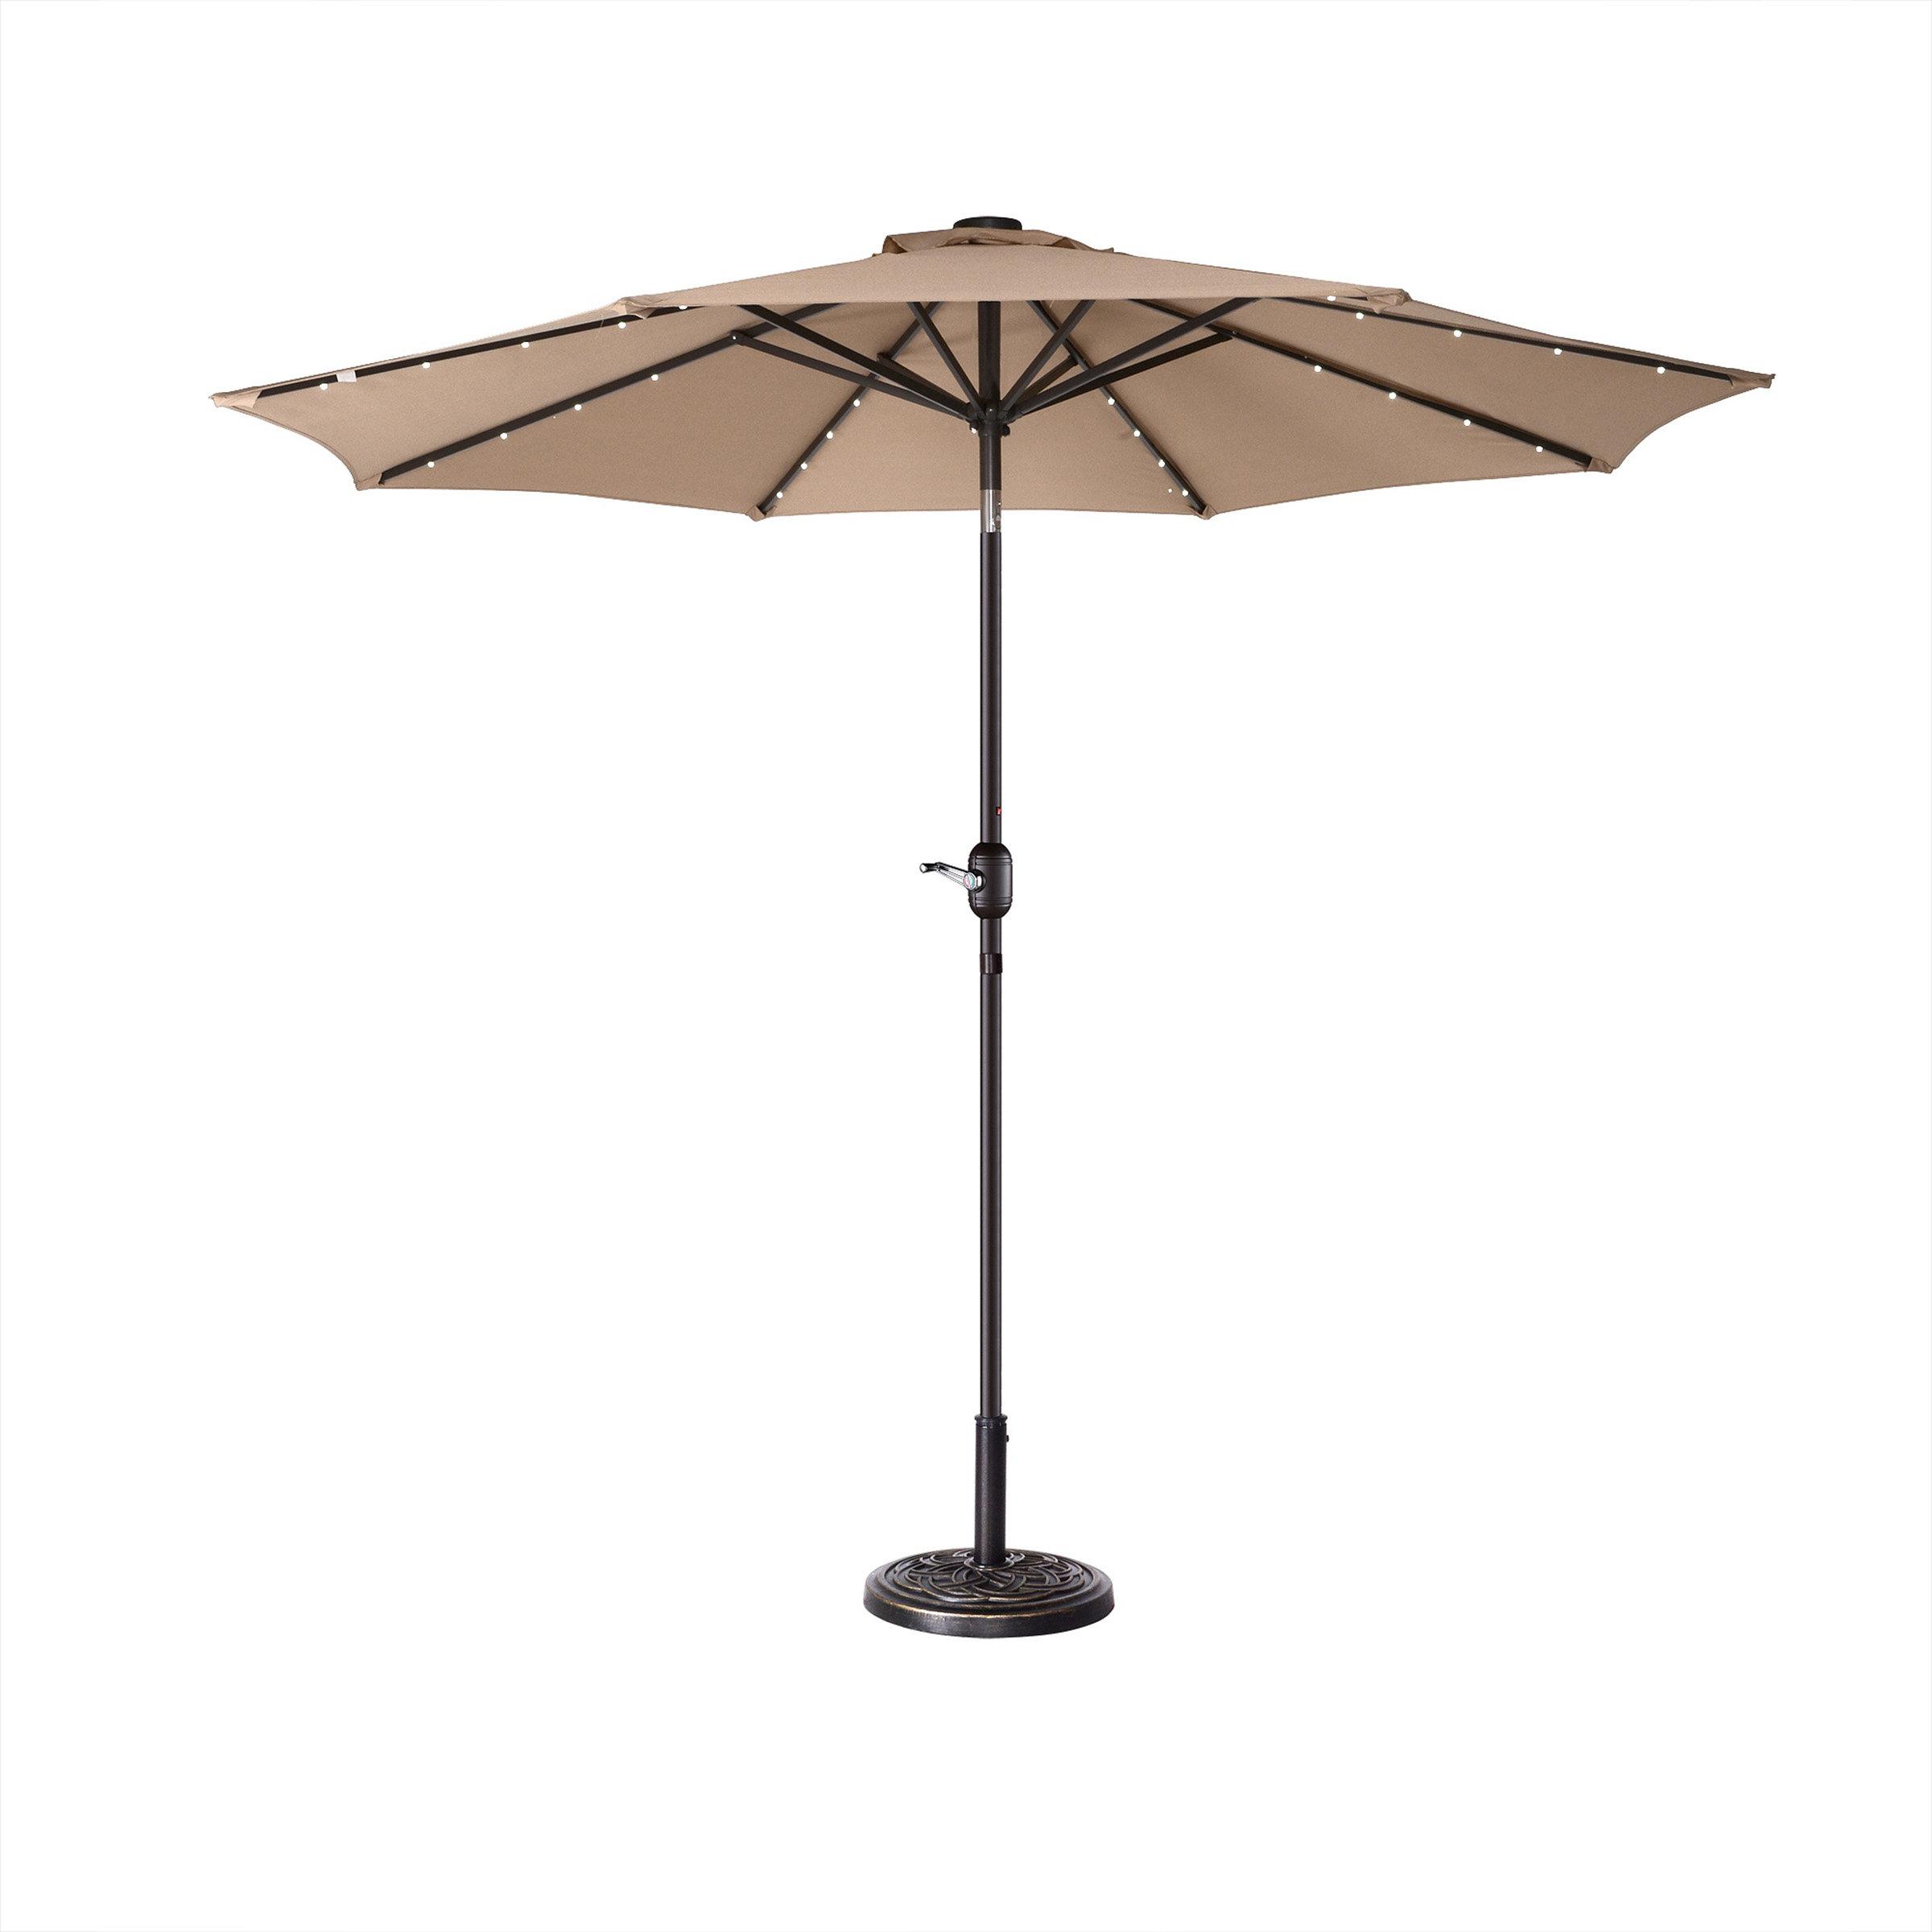 Fashionable Colburn Half Market Umbrellas Pertaining To Coggeshall Led Lighted 9' Market Umbrella (View 15 of 20)